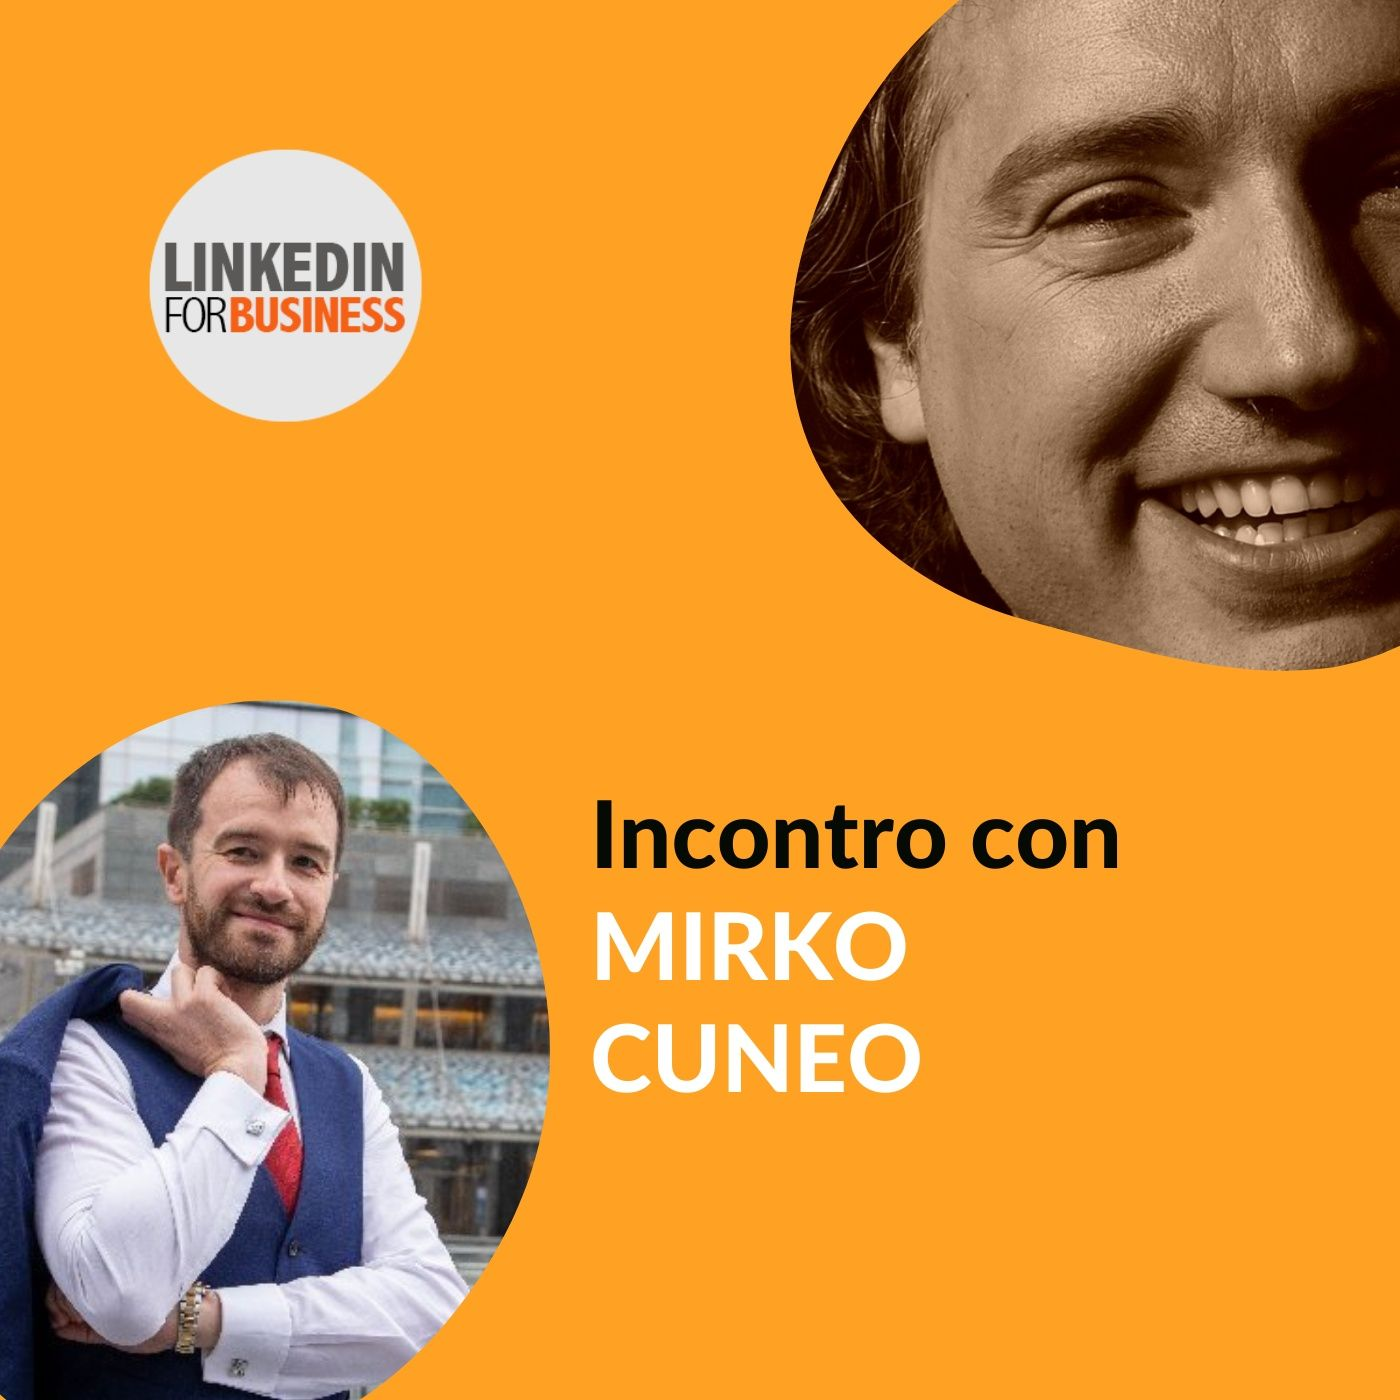 132 - LinkedInForBusiness incontra Mirko Cuneo